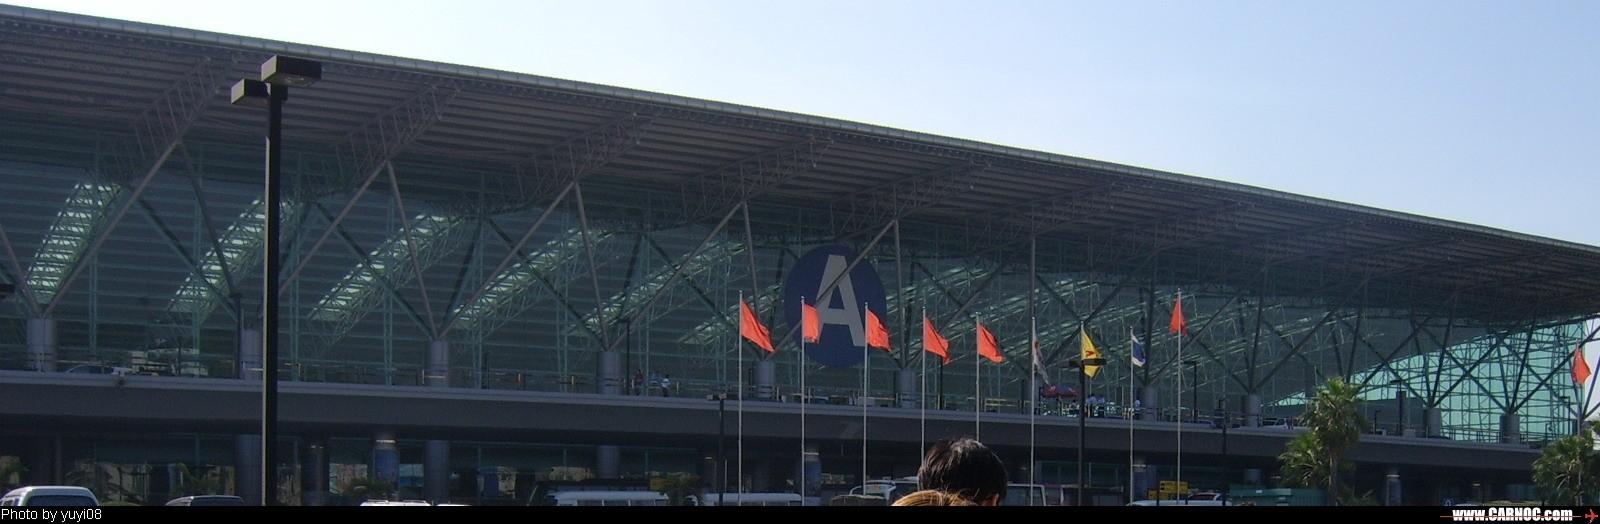 Re:[原创]机场的候机地带---航站楼—国内(欢迎大家跟帖)    中国深圳宝安机场